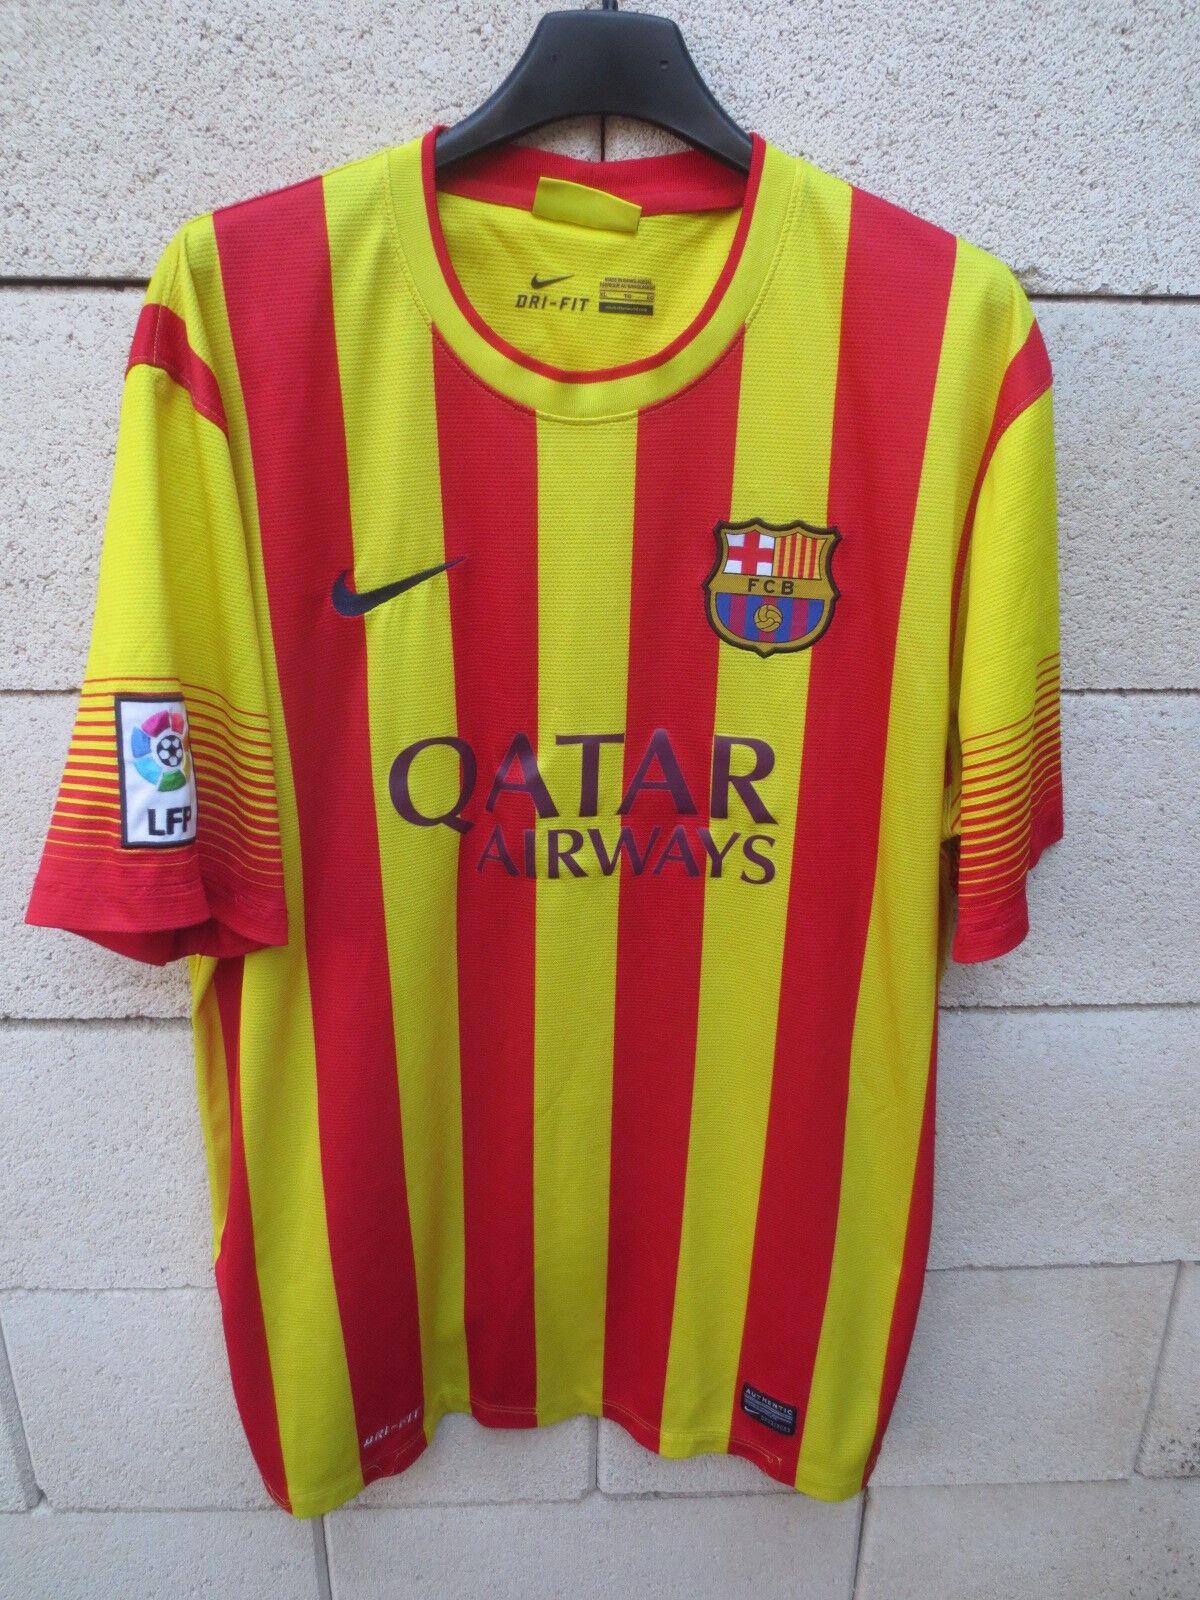 Maillot BARCELONE BARCELONA 2014 camiseta shirt NIKE Catalunya LFP Catalan XL